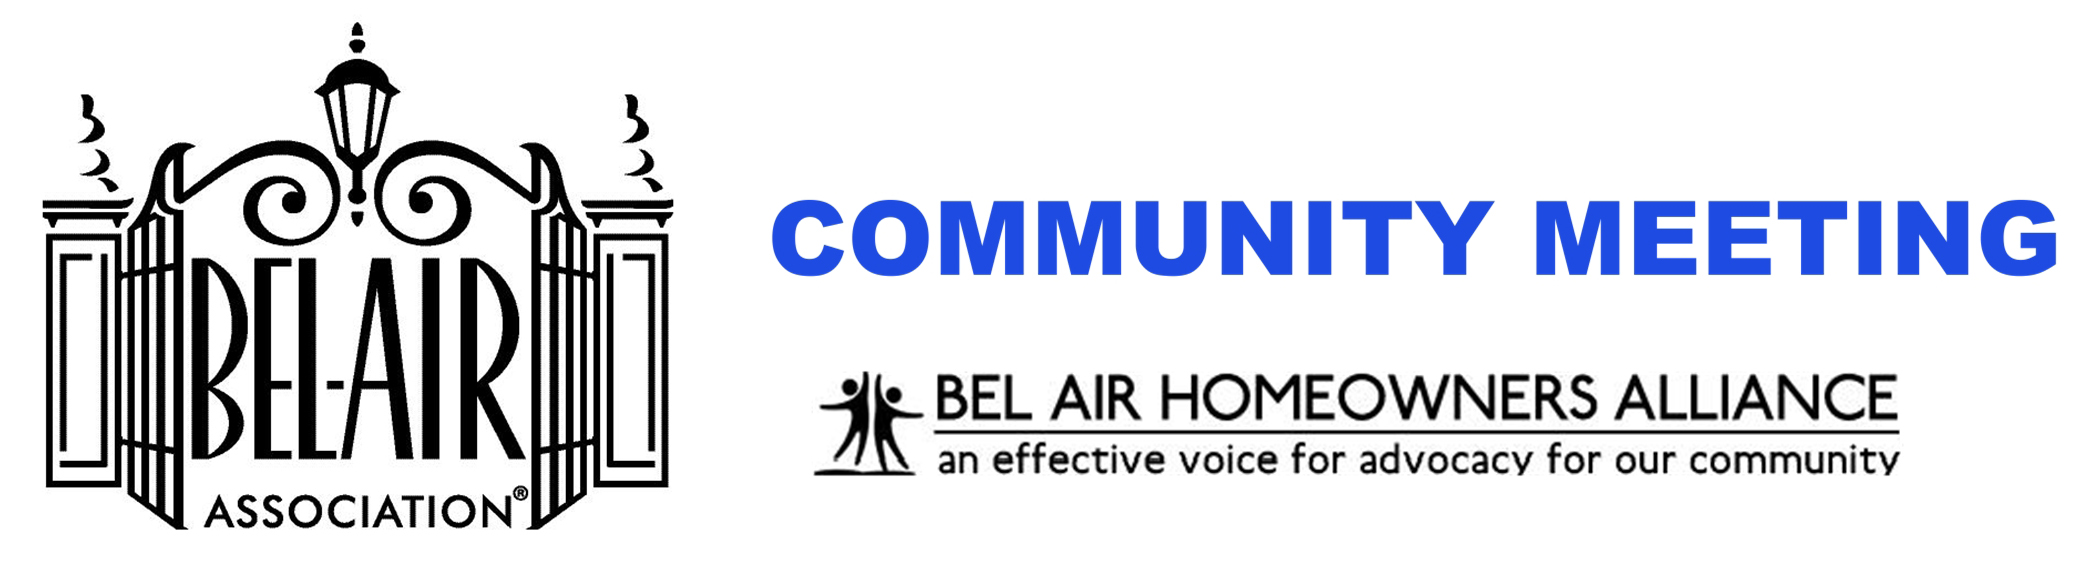 Community Meeting banner.jpg